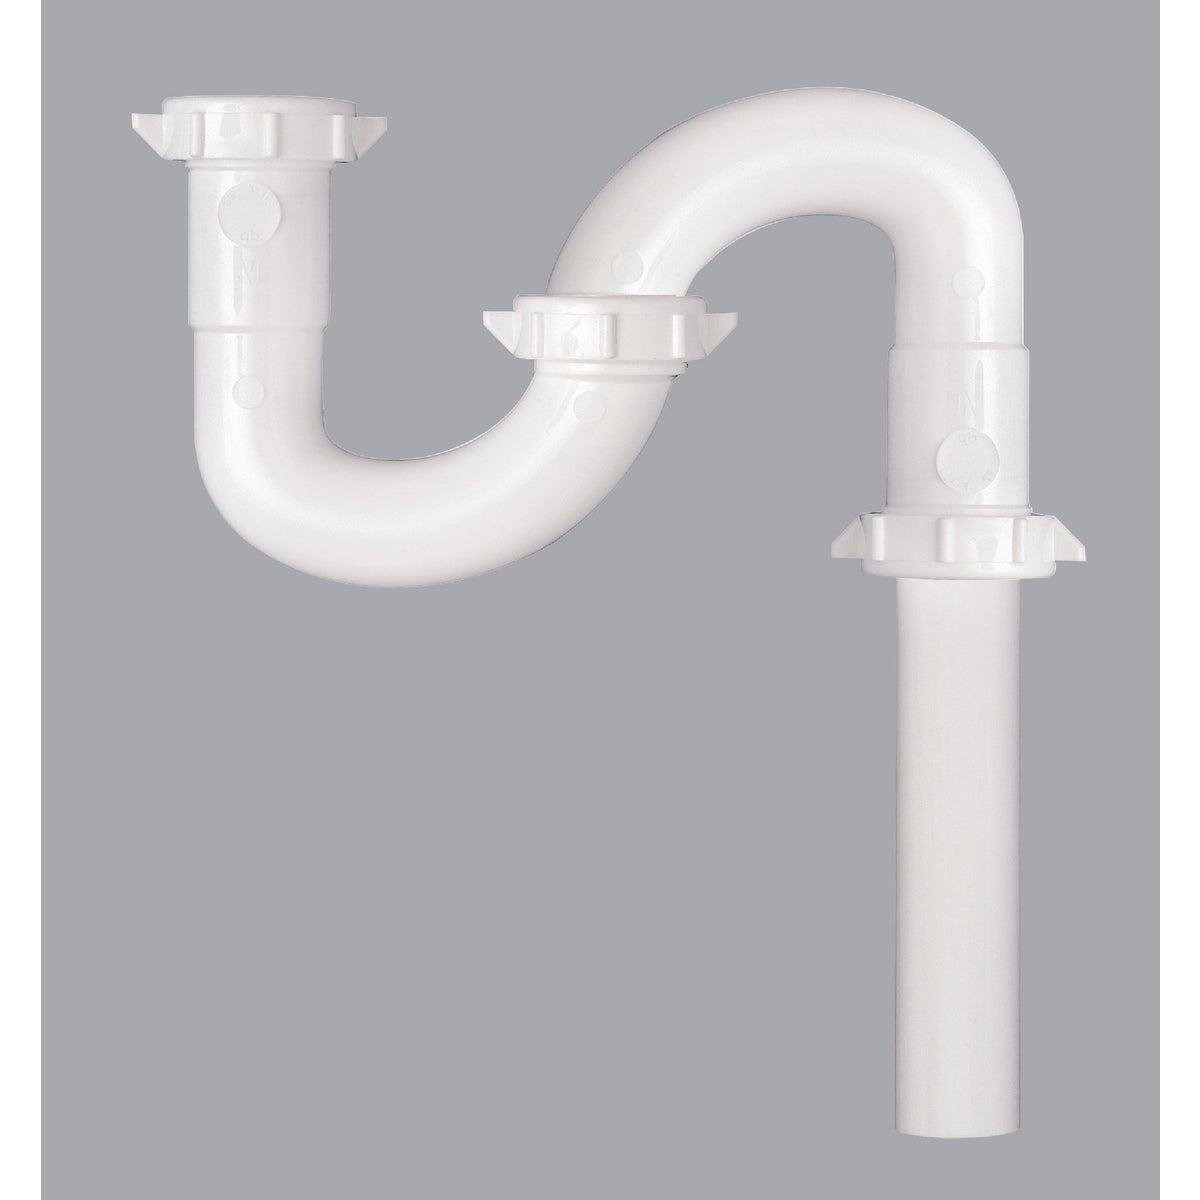 1-1/2 WHT PLASTIC S-TRAP - 700WK by Plumb Pak/keeney Mfg